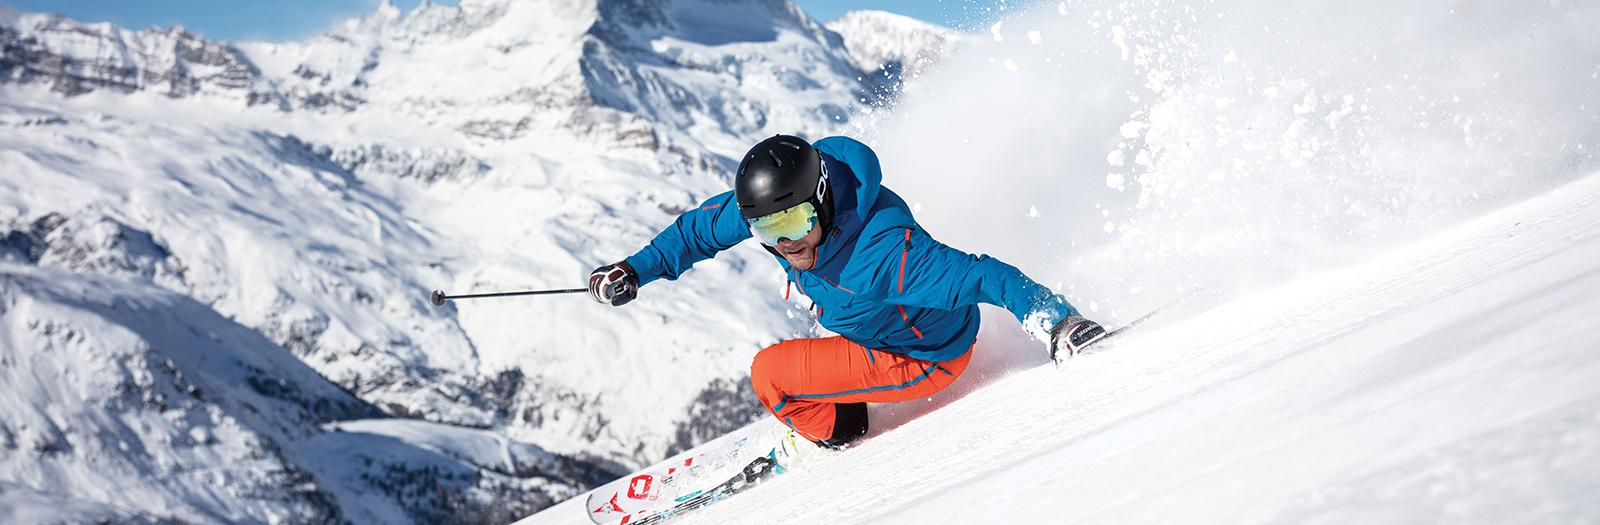 zermatt ski resort, zermatt switzerland, ski the swiss alps, ski the matterhorn, matterhorn ski trip, switzerland ski trip, zermatt ski trip